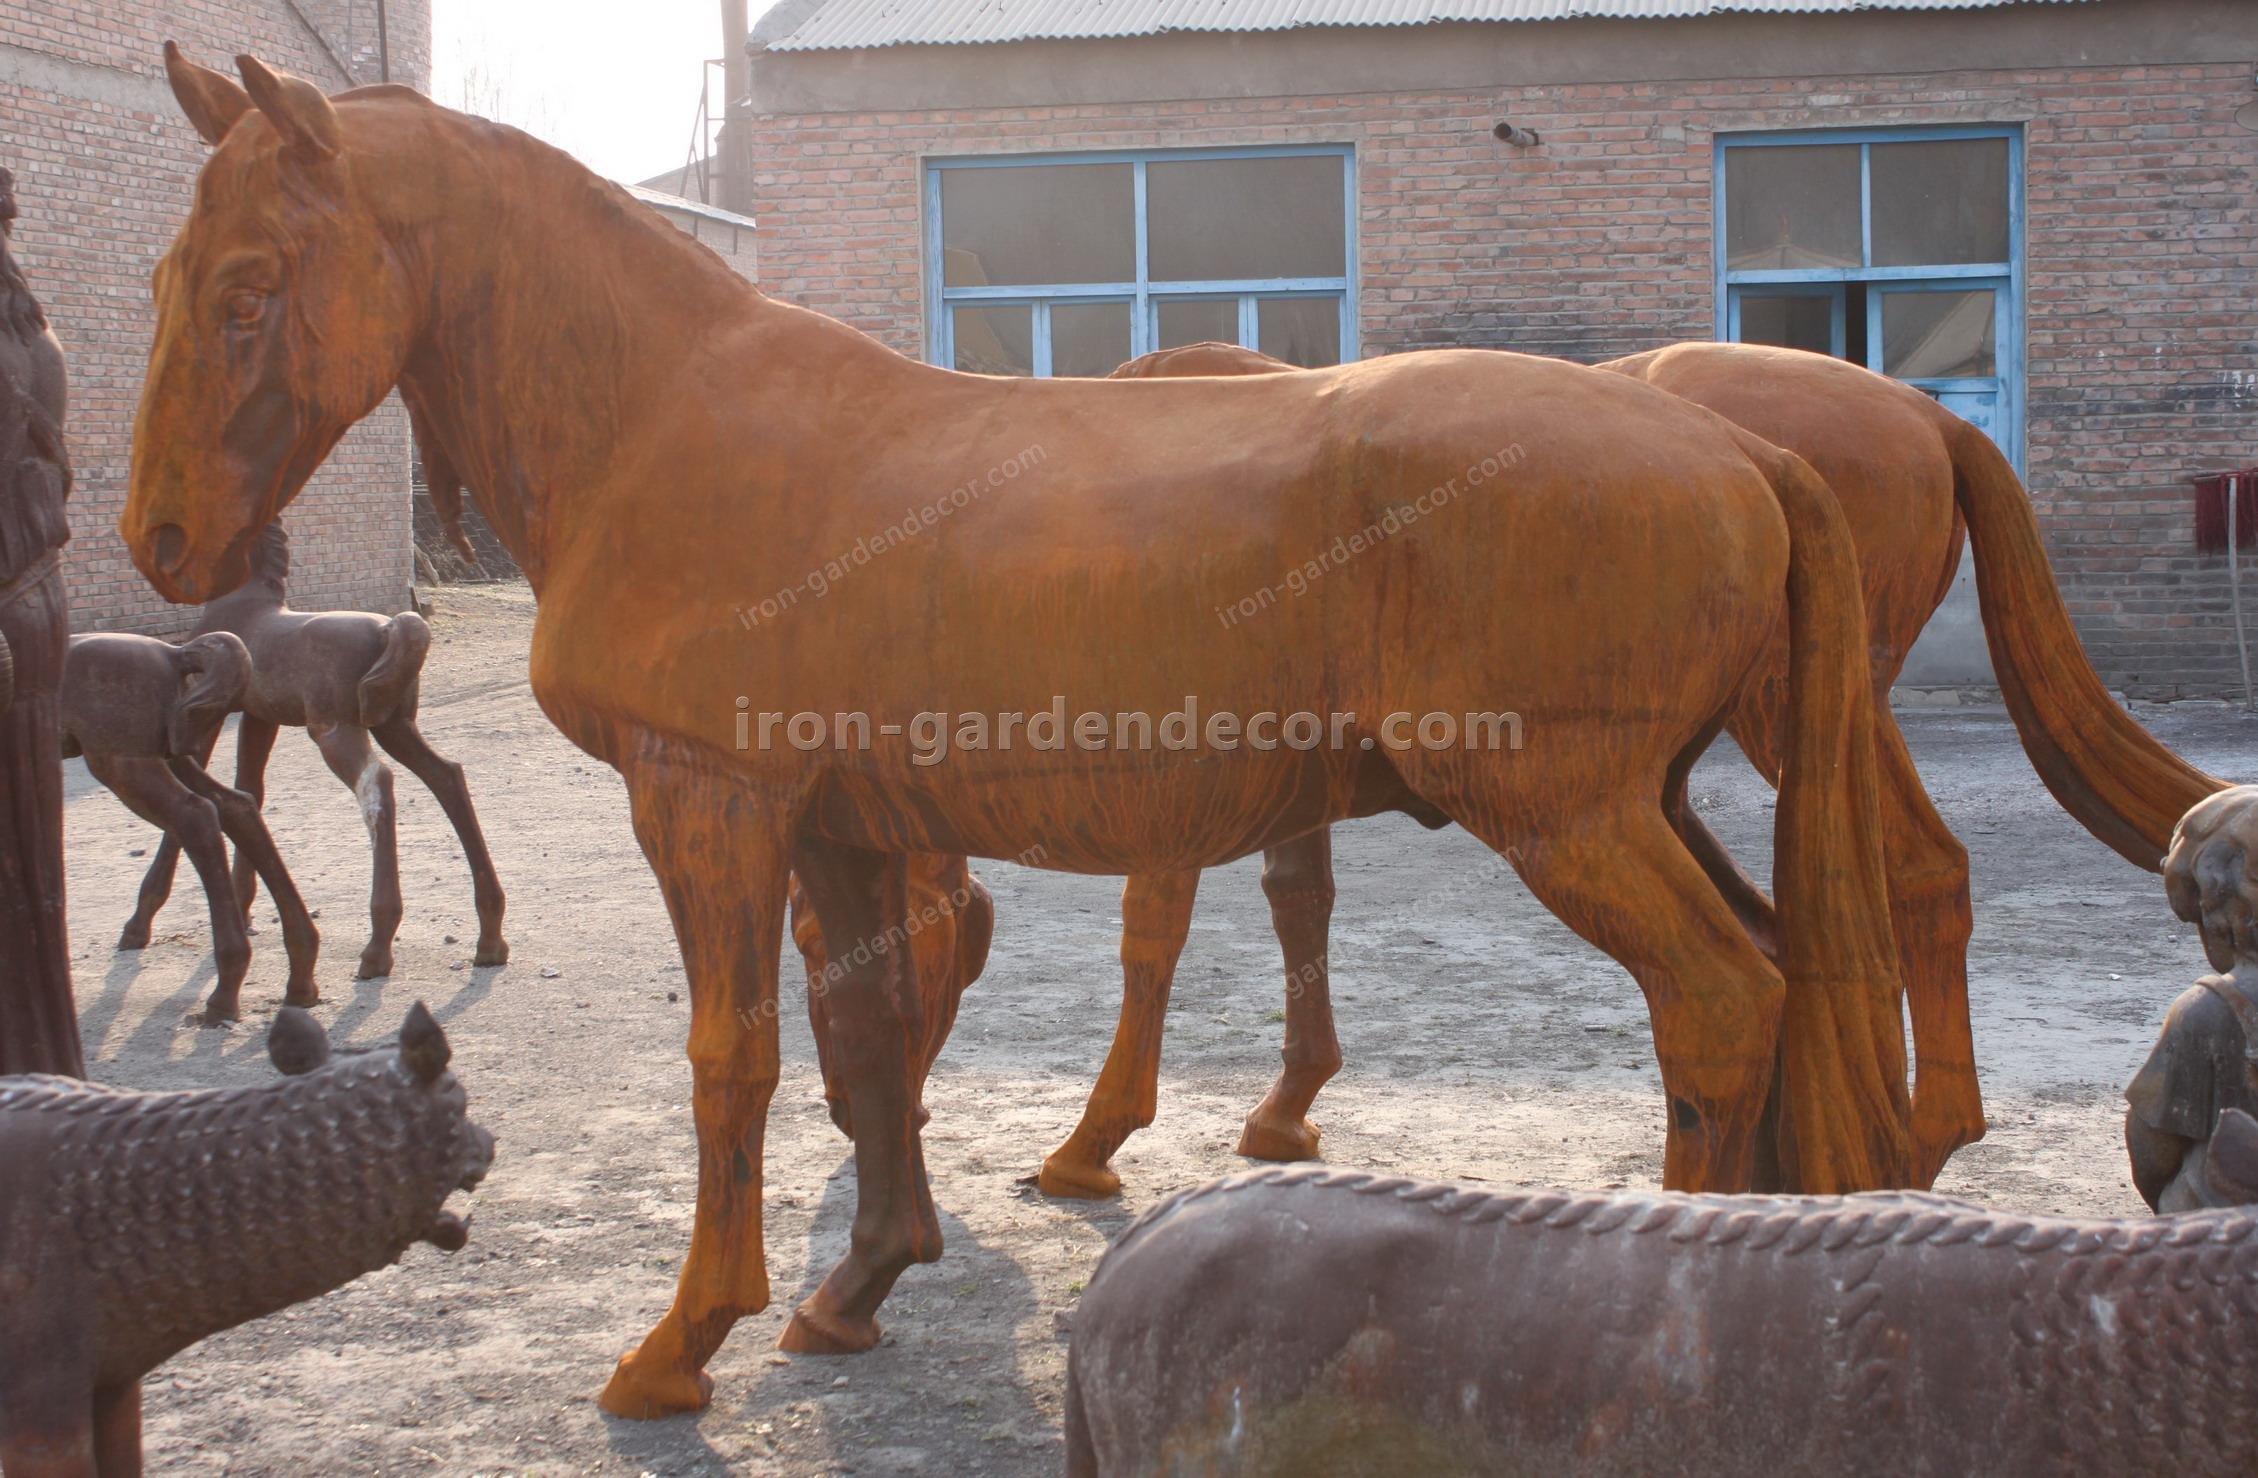 normal size cast iron animal of horse garden animal, large horse animal-G1275 (3)